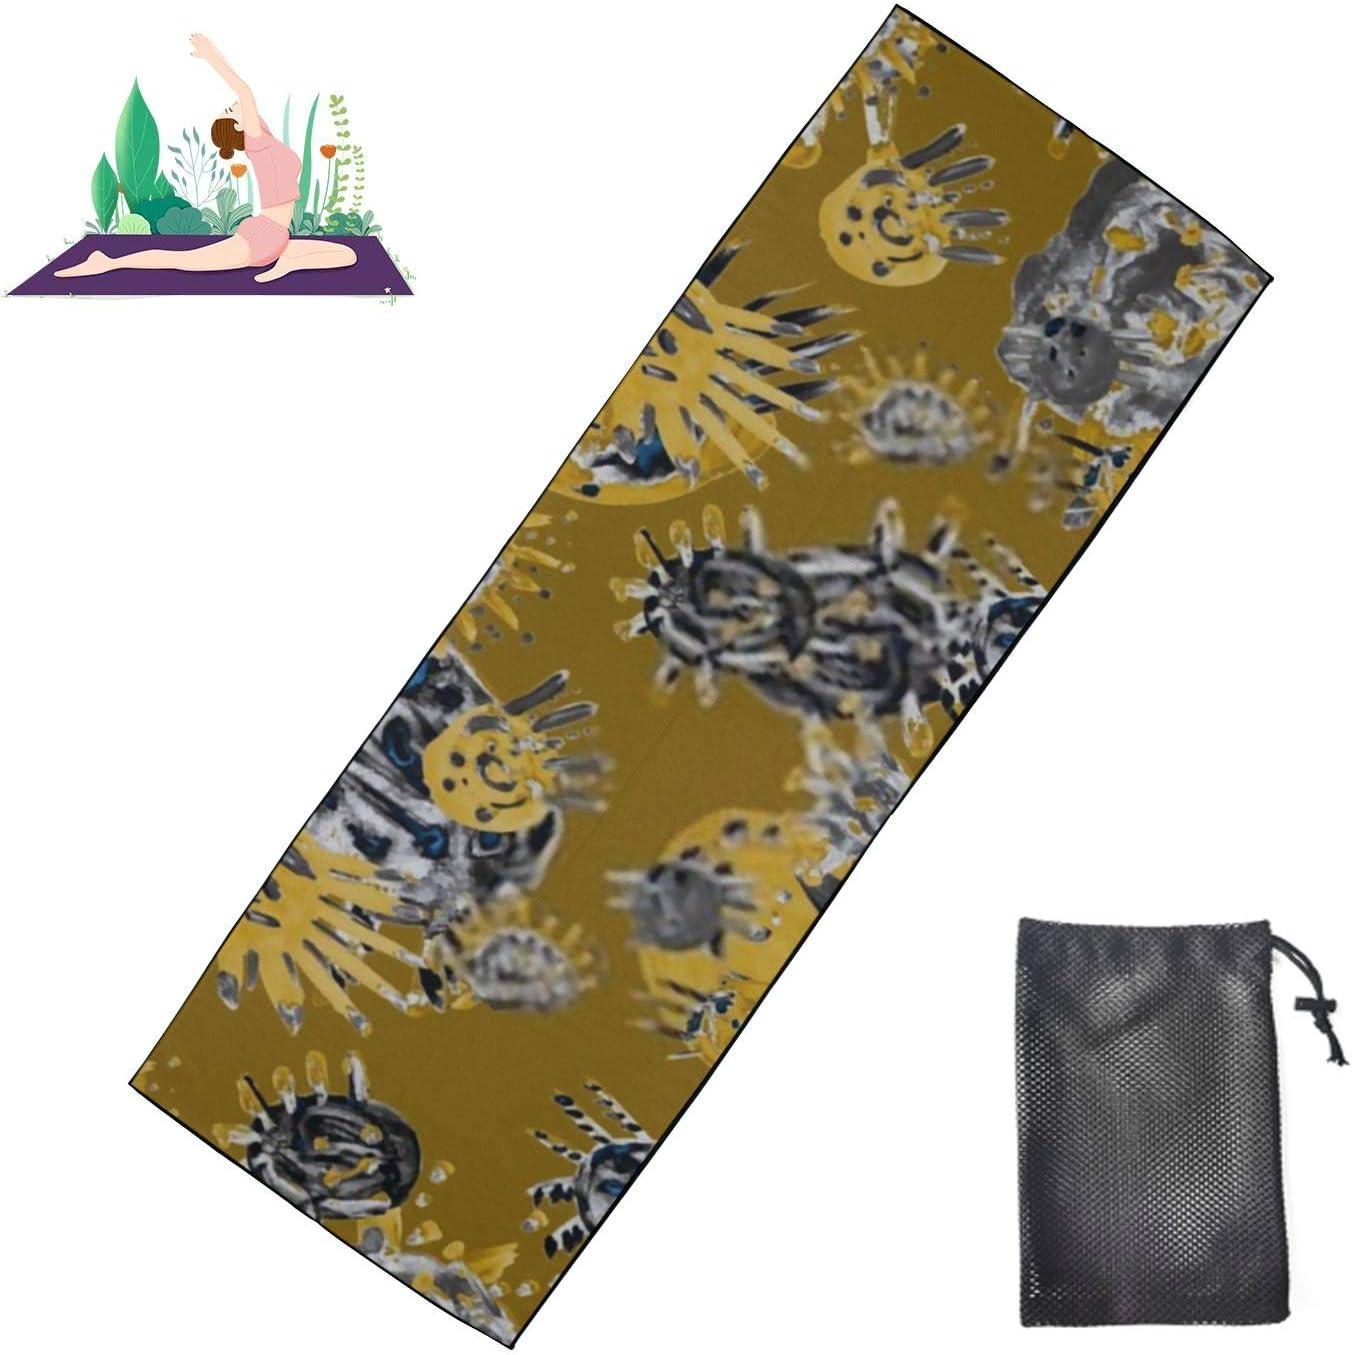 HJSHG Yoga Mat Towel Creative Pattern Elemen Hand Seamless Drawn Seattle Mall Direct sale of manufacturer